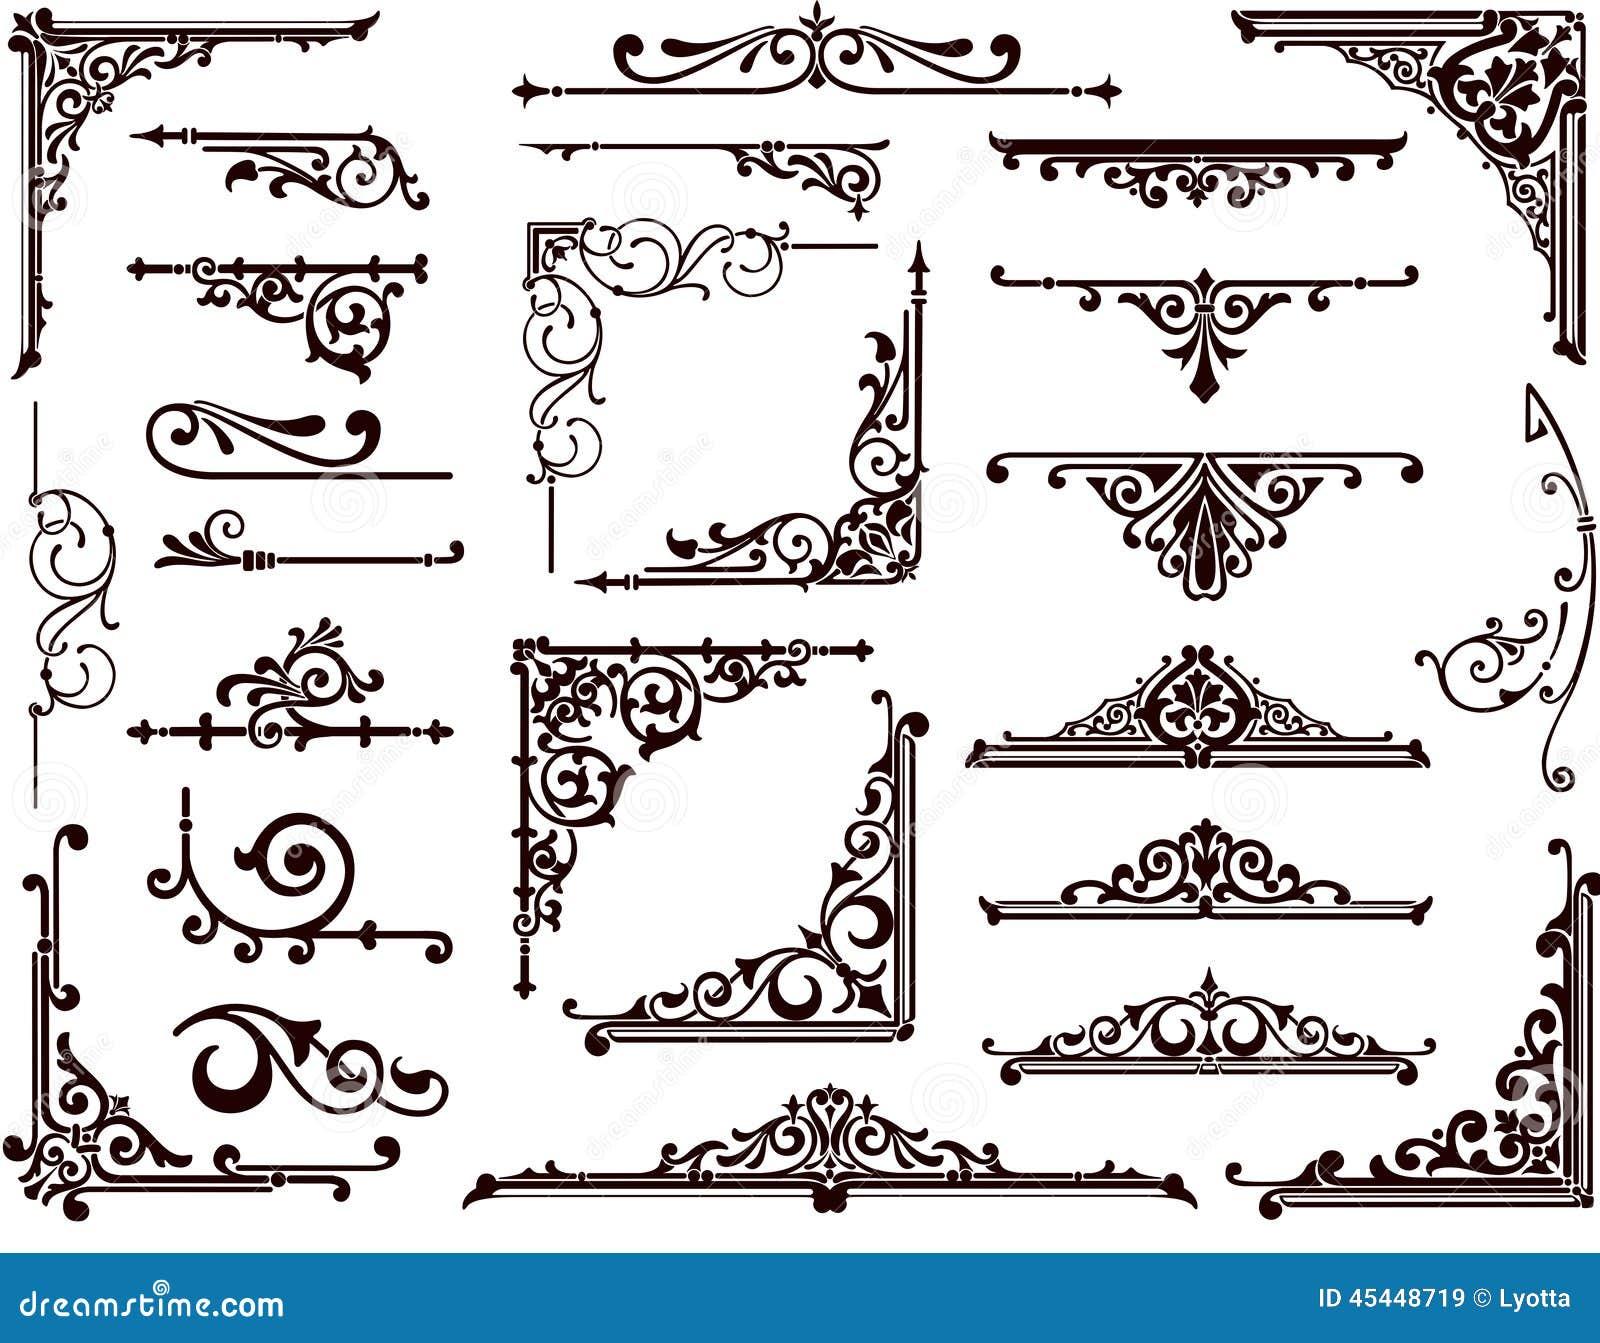 Ornamental Design Borders And Corners Stock Vector - Image: 45448719